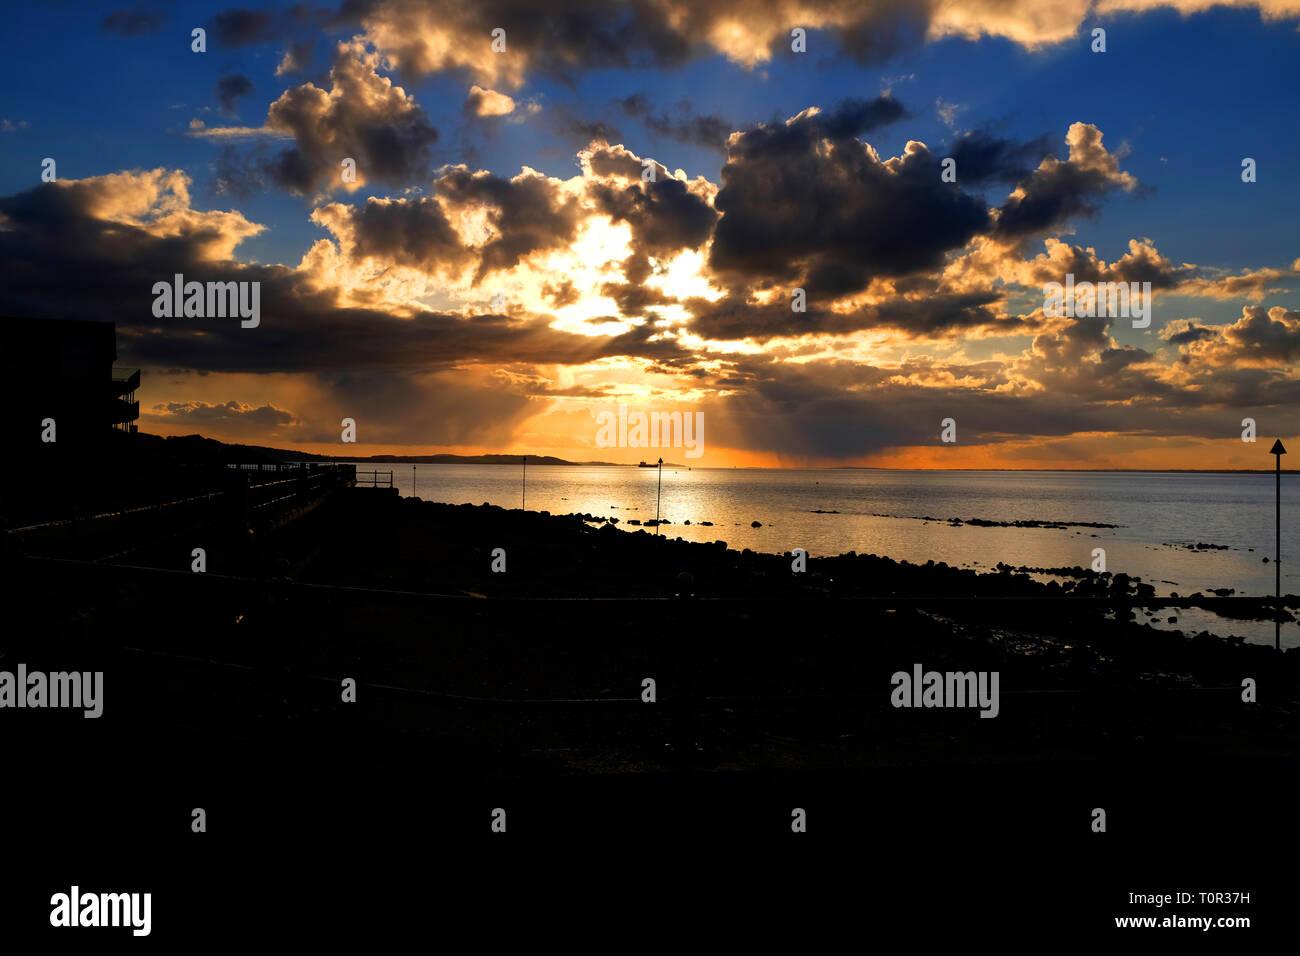 dramatic,sunset,over,sea,clouds,light,beams,Gurnard,Isle of Wight, England, UK, - Stock Image